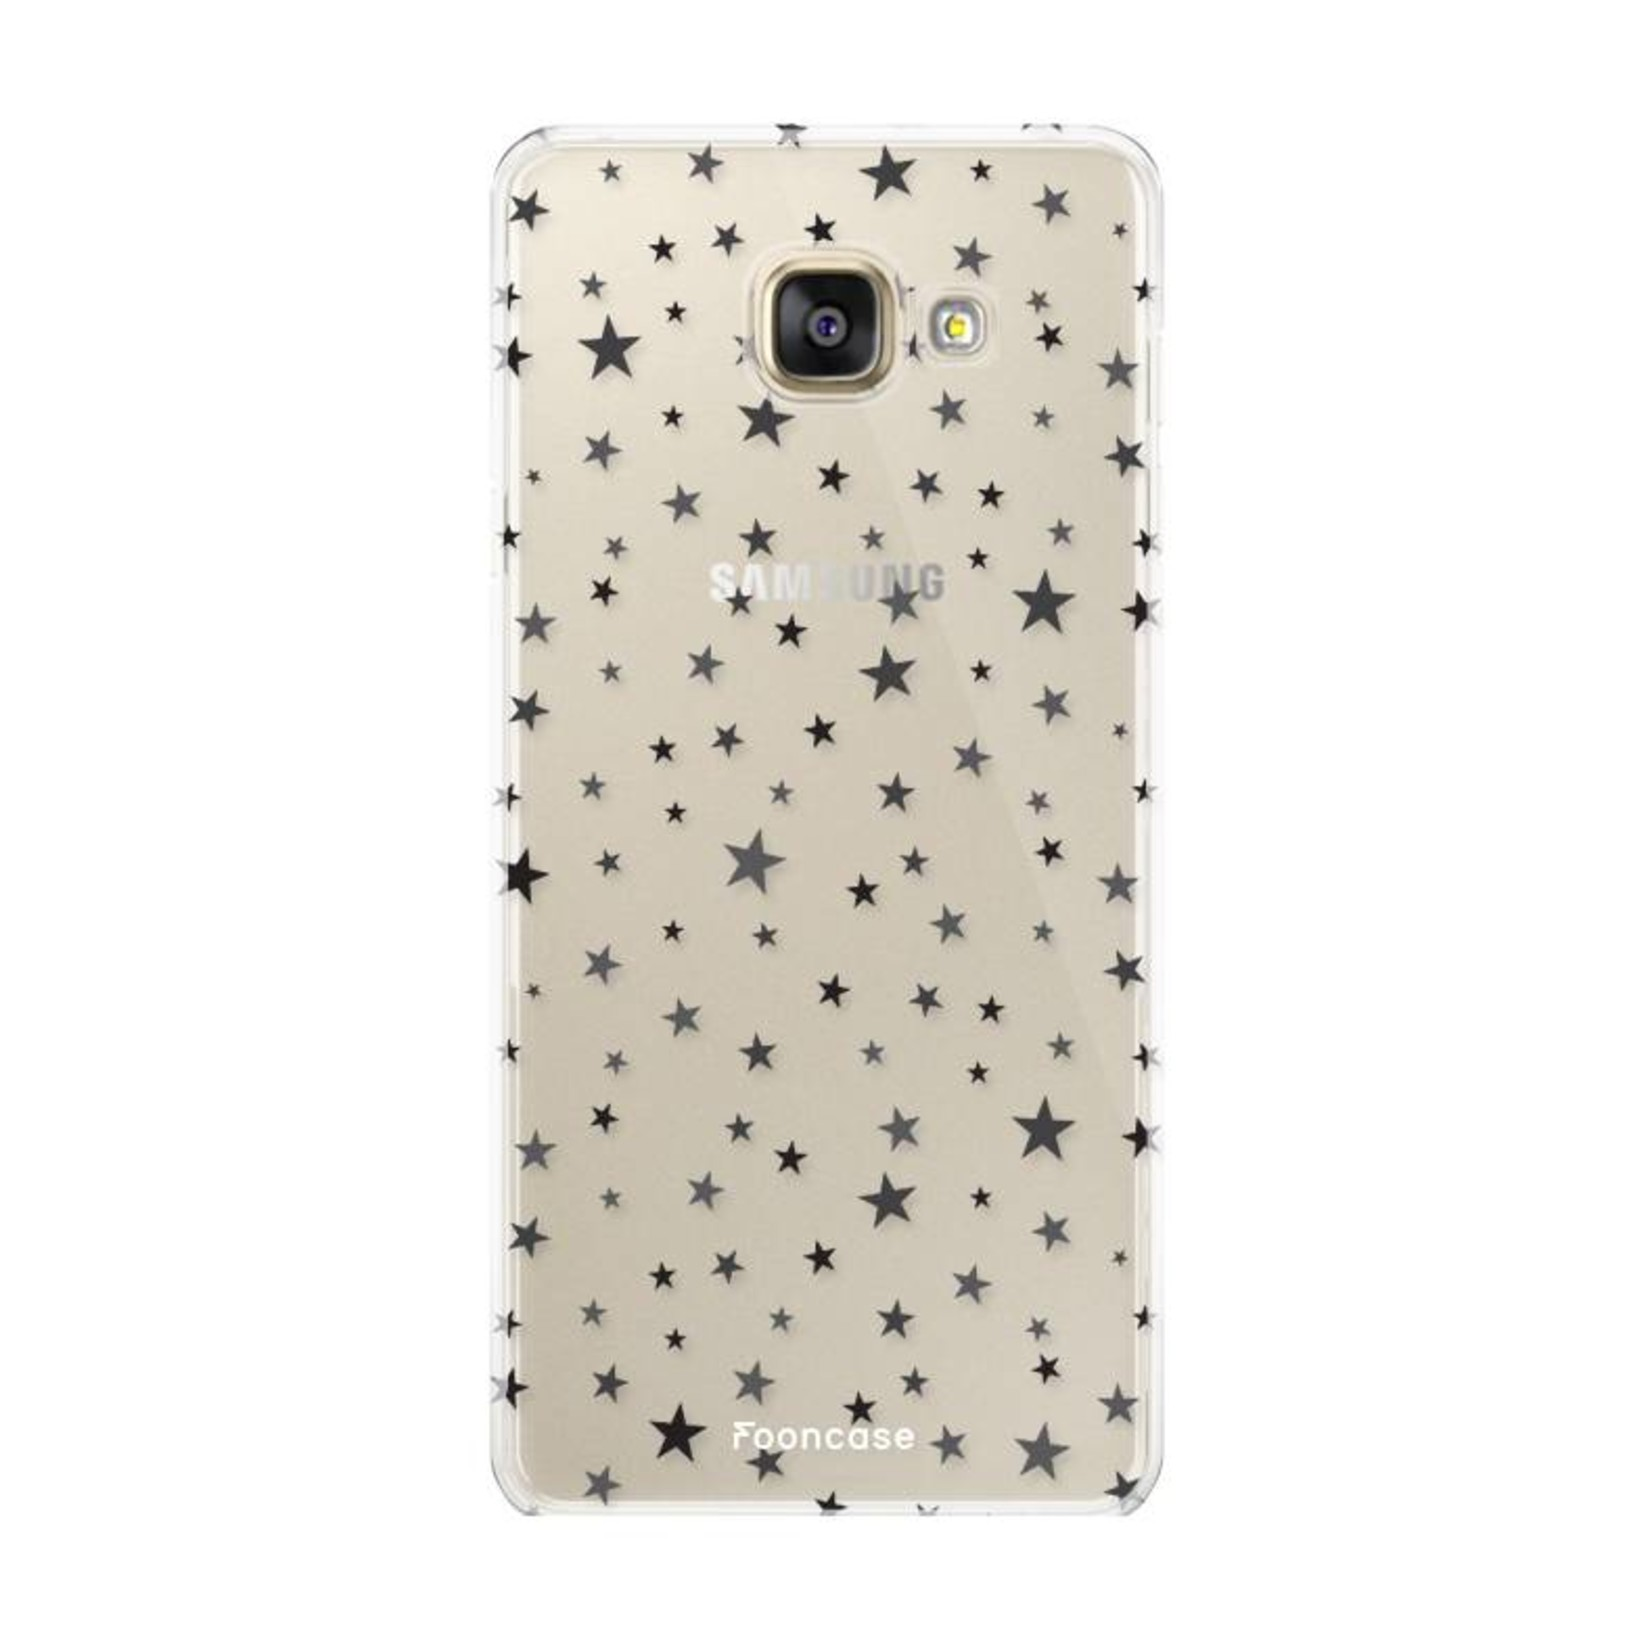 FOONCASE Samsung Galaxy A5 2016 Handyhülle - Sterne